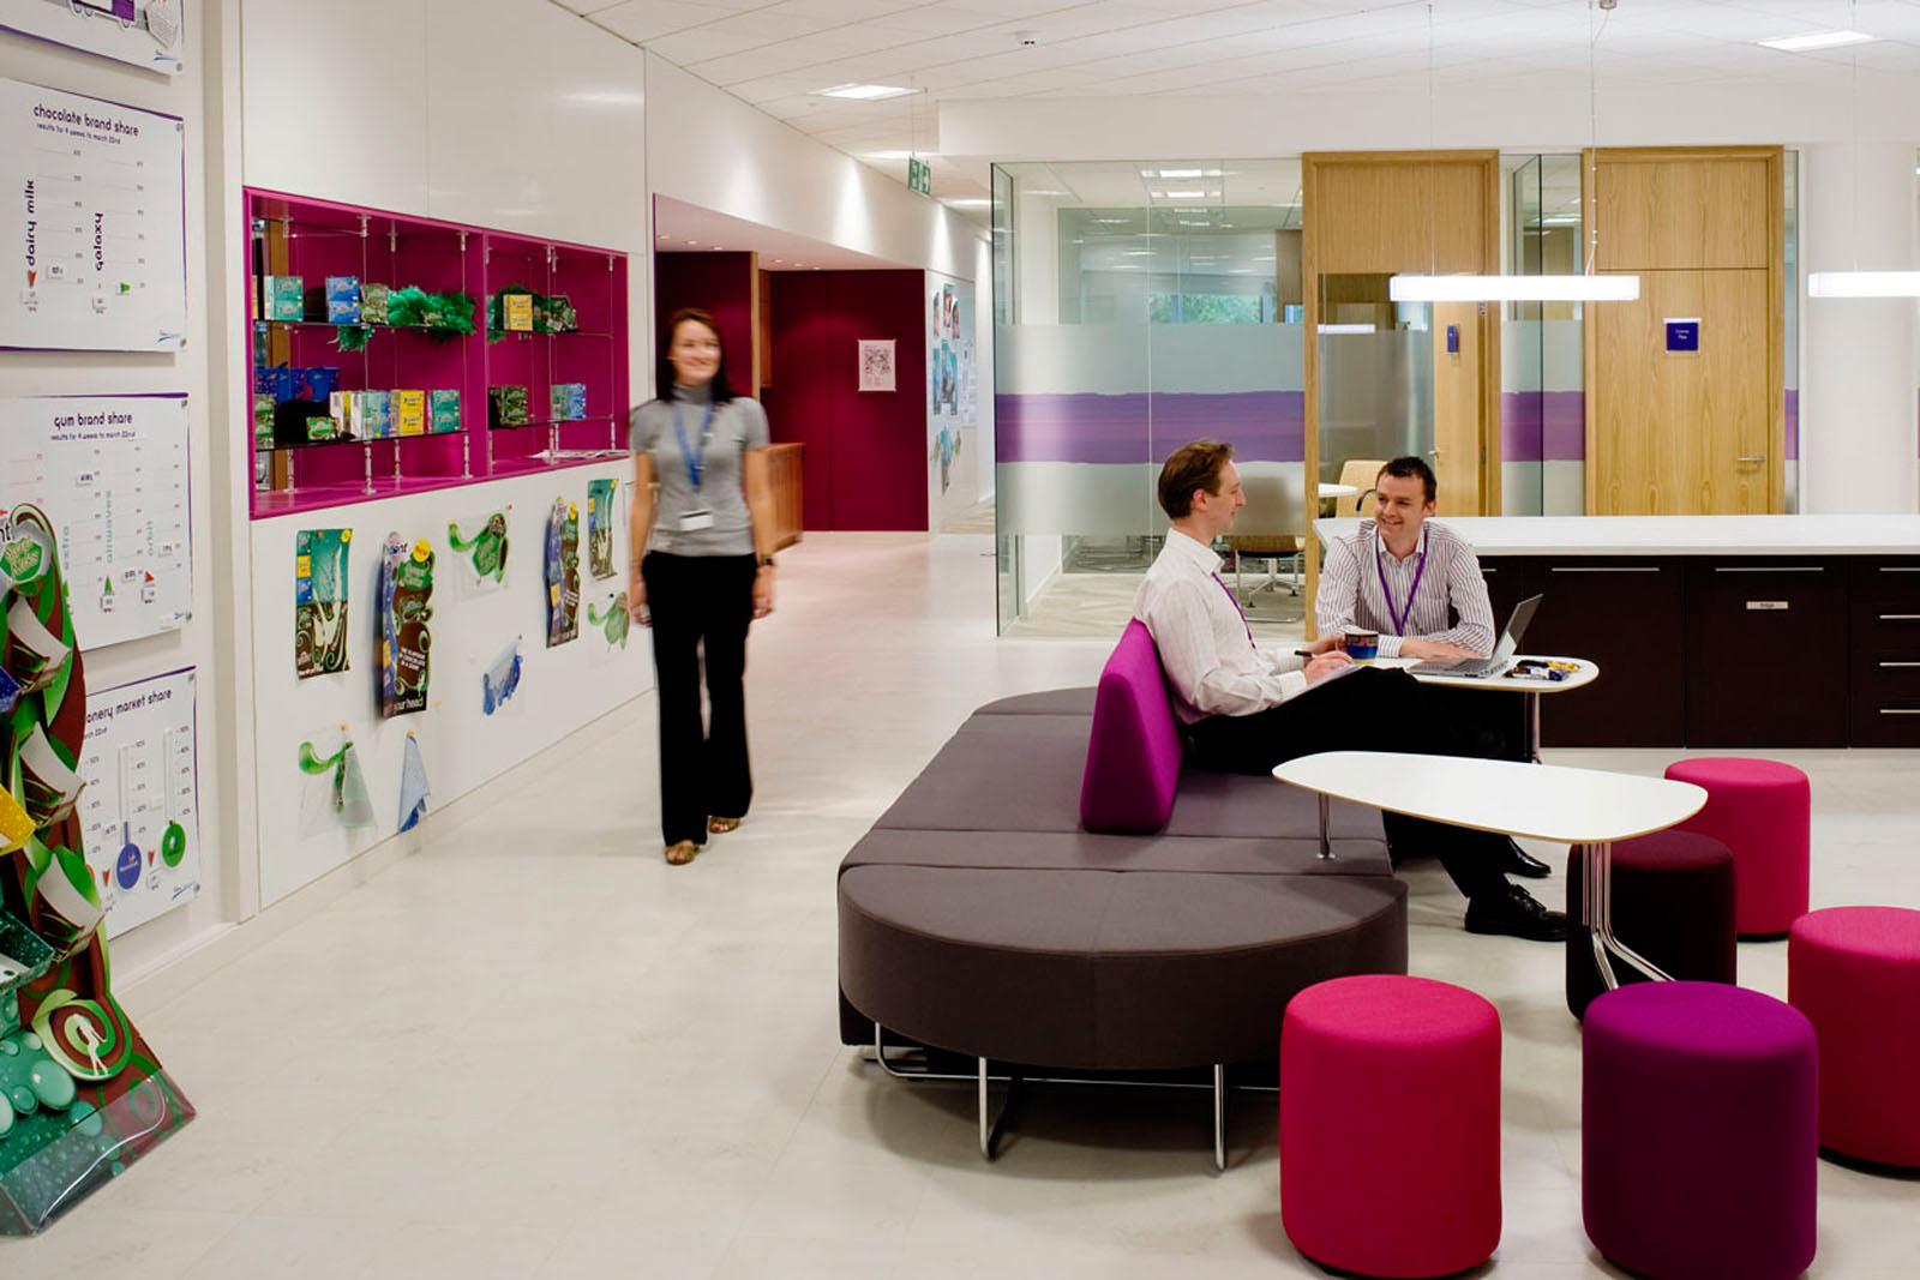 Tips for open office space etiquette monster